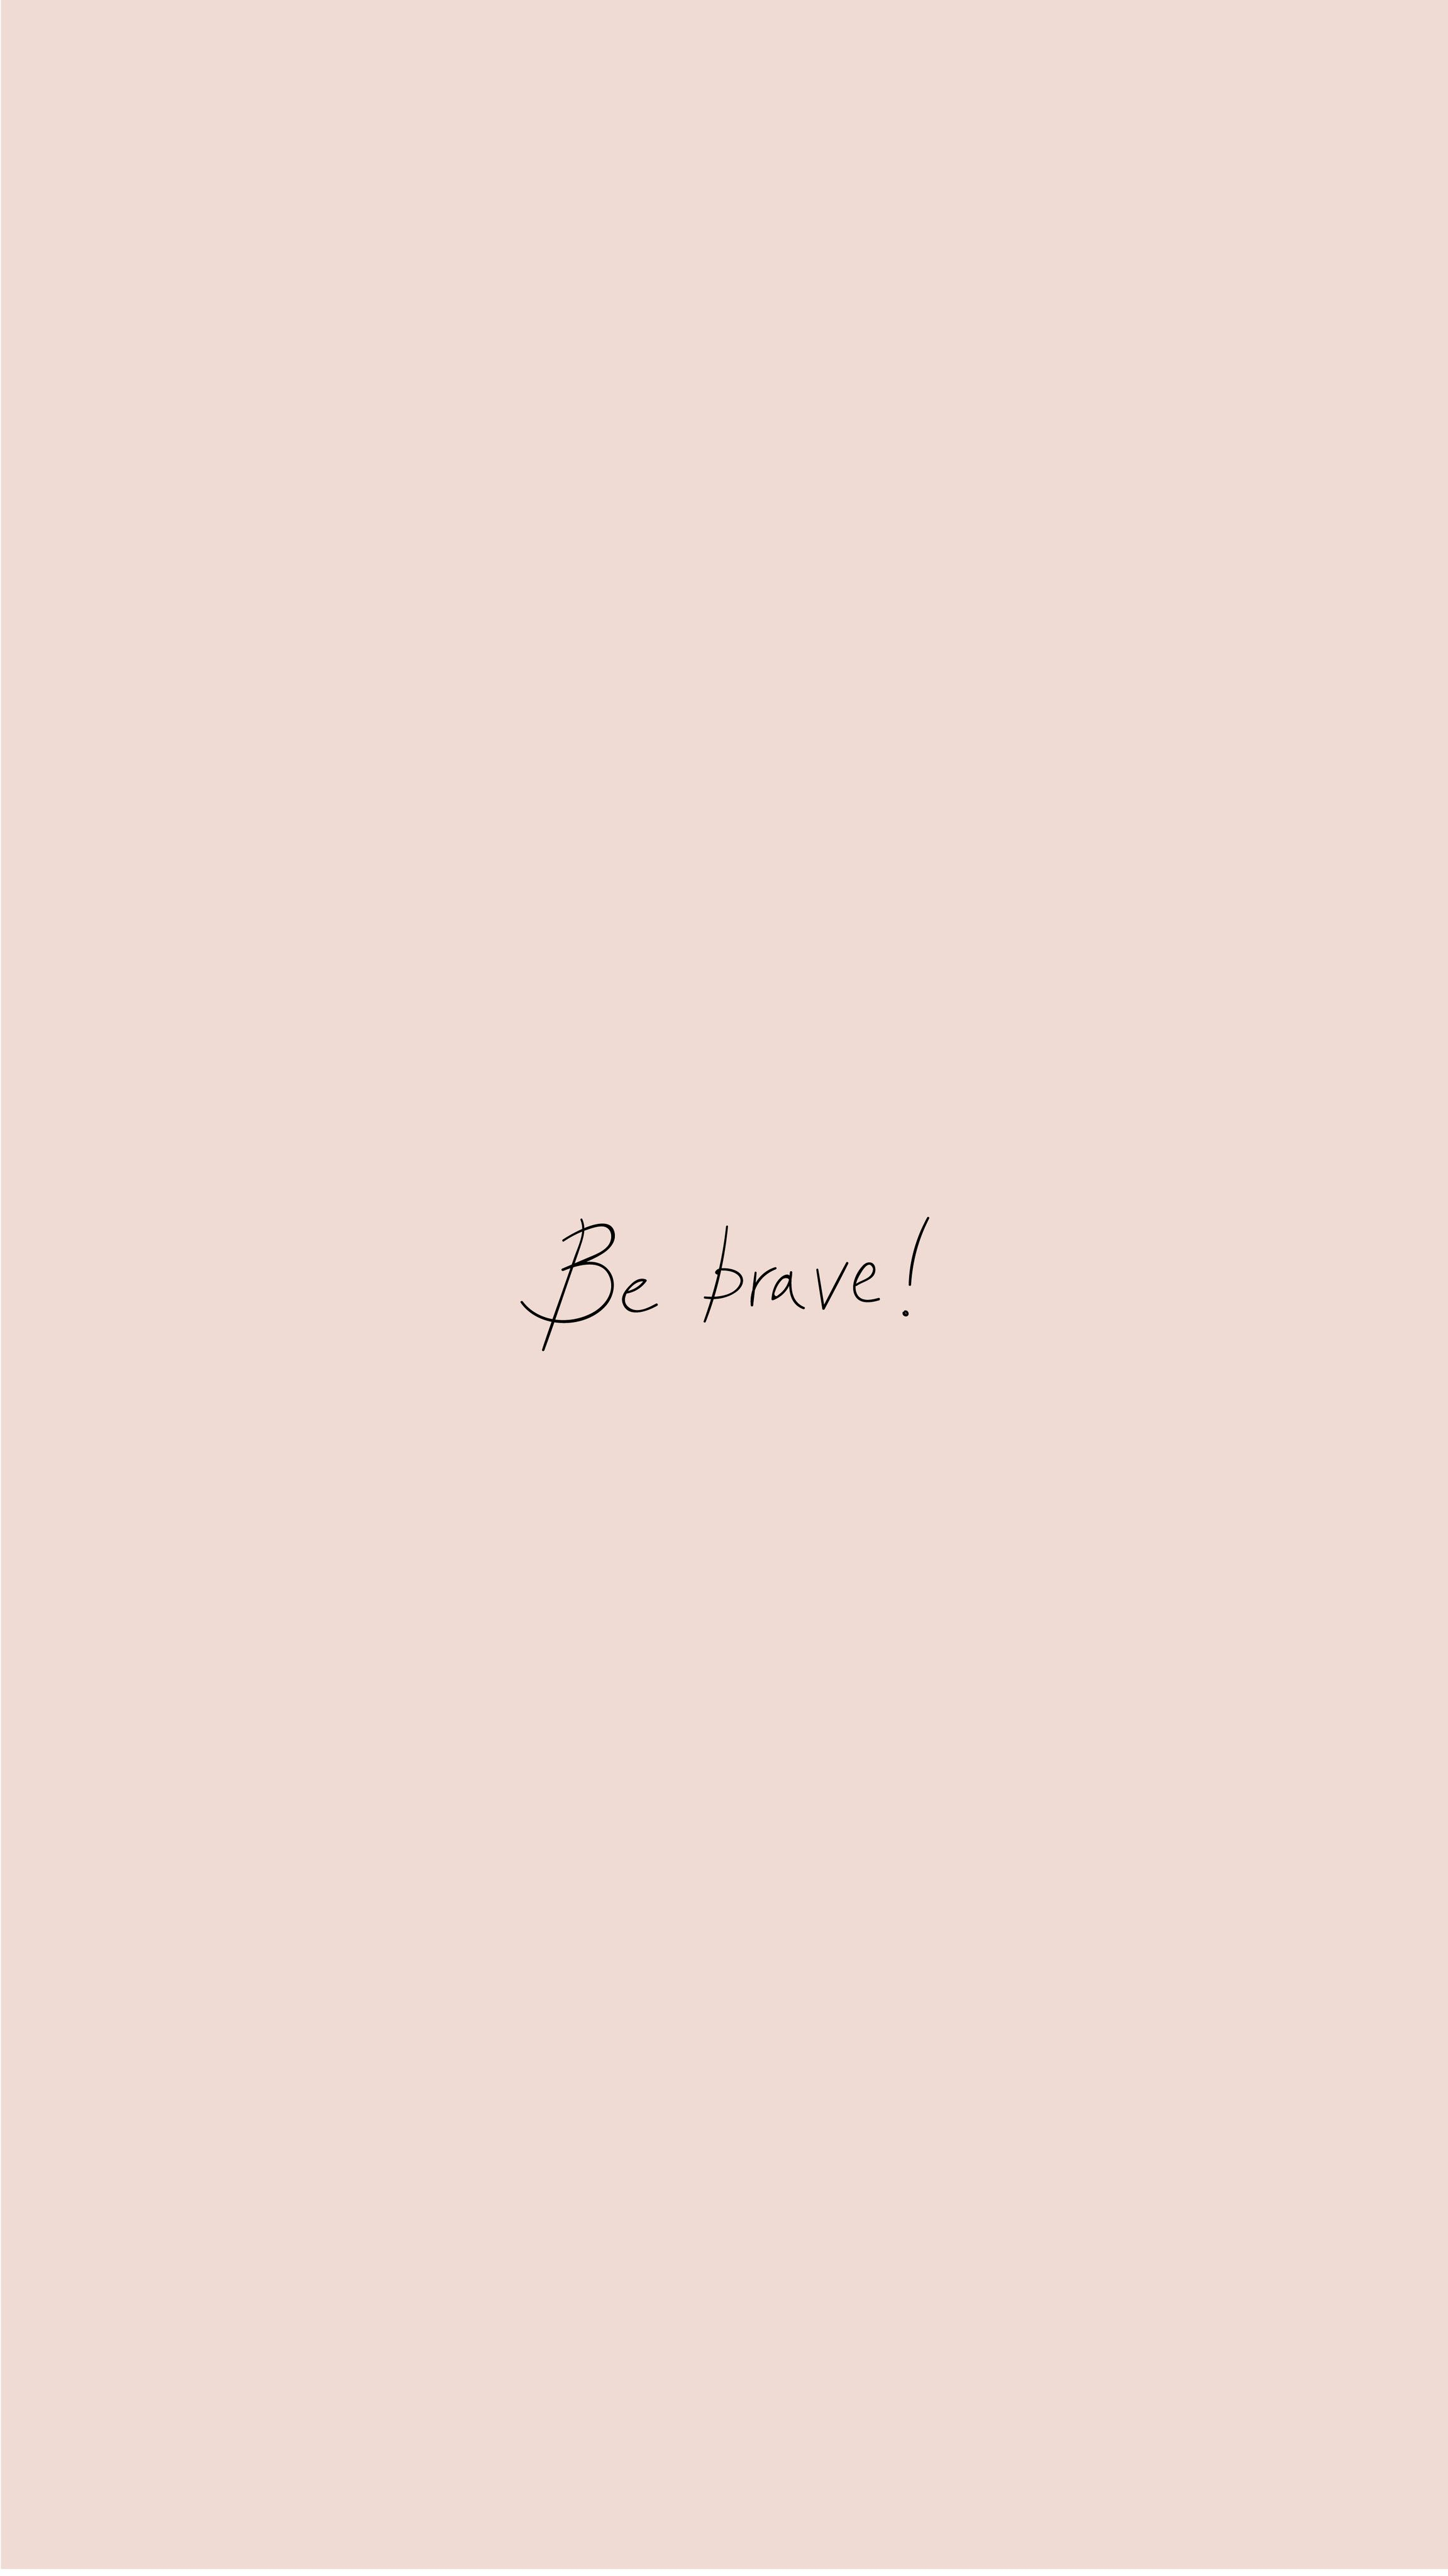 Arvowear Arvo Phonebackground Wallpaper Background Bebrave Funwording Pale Pink Fundos Com Citacoes Frases Tumblrs Planos De Fundo